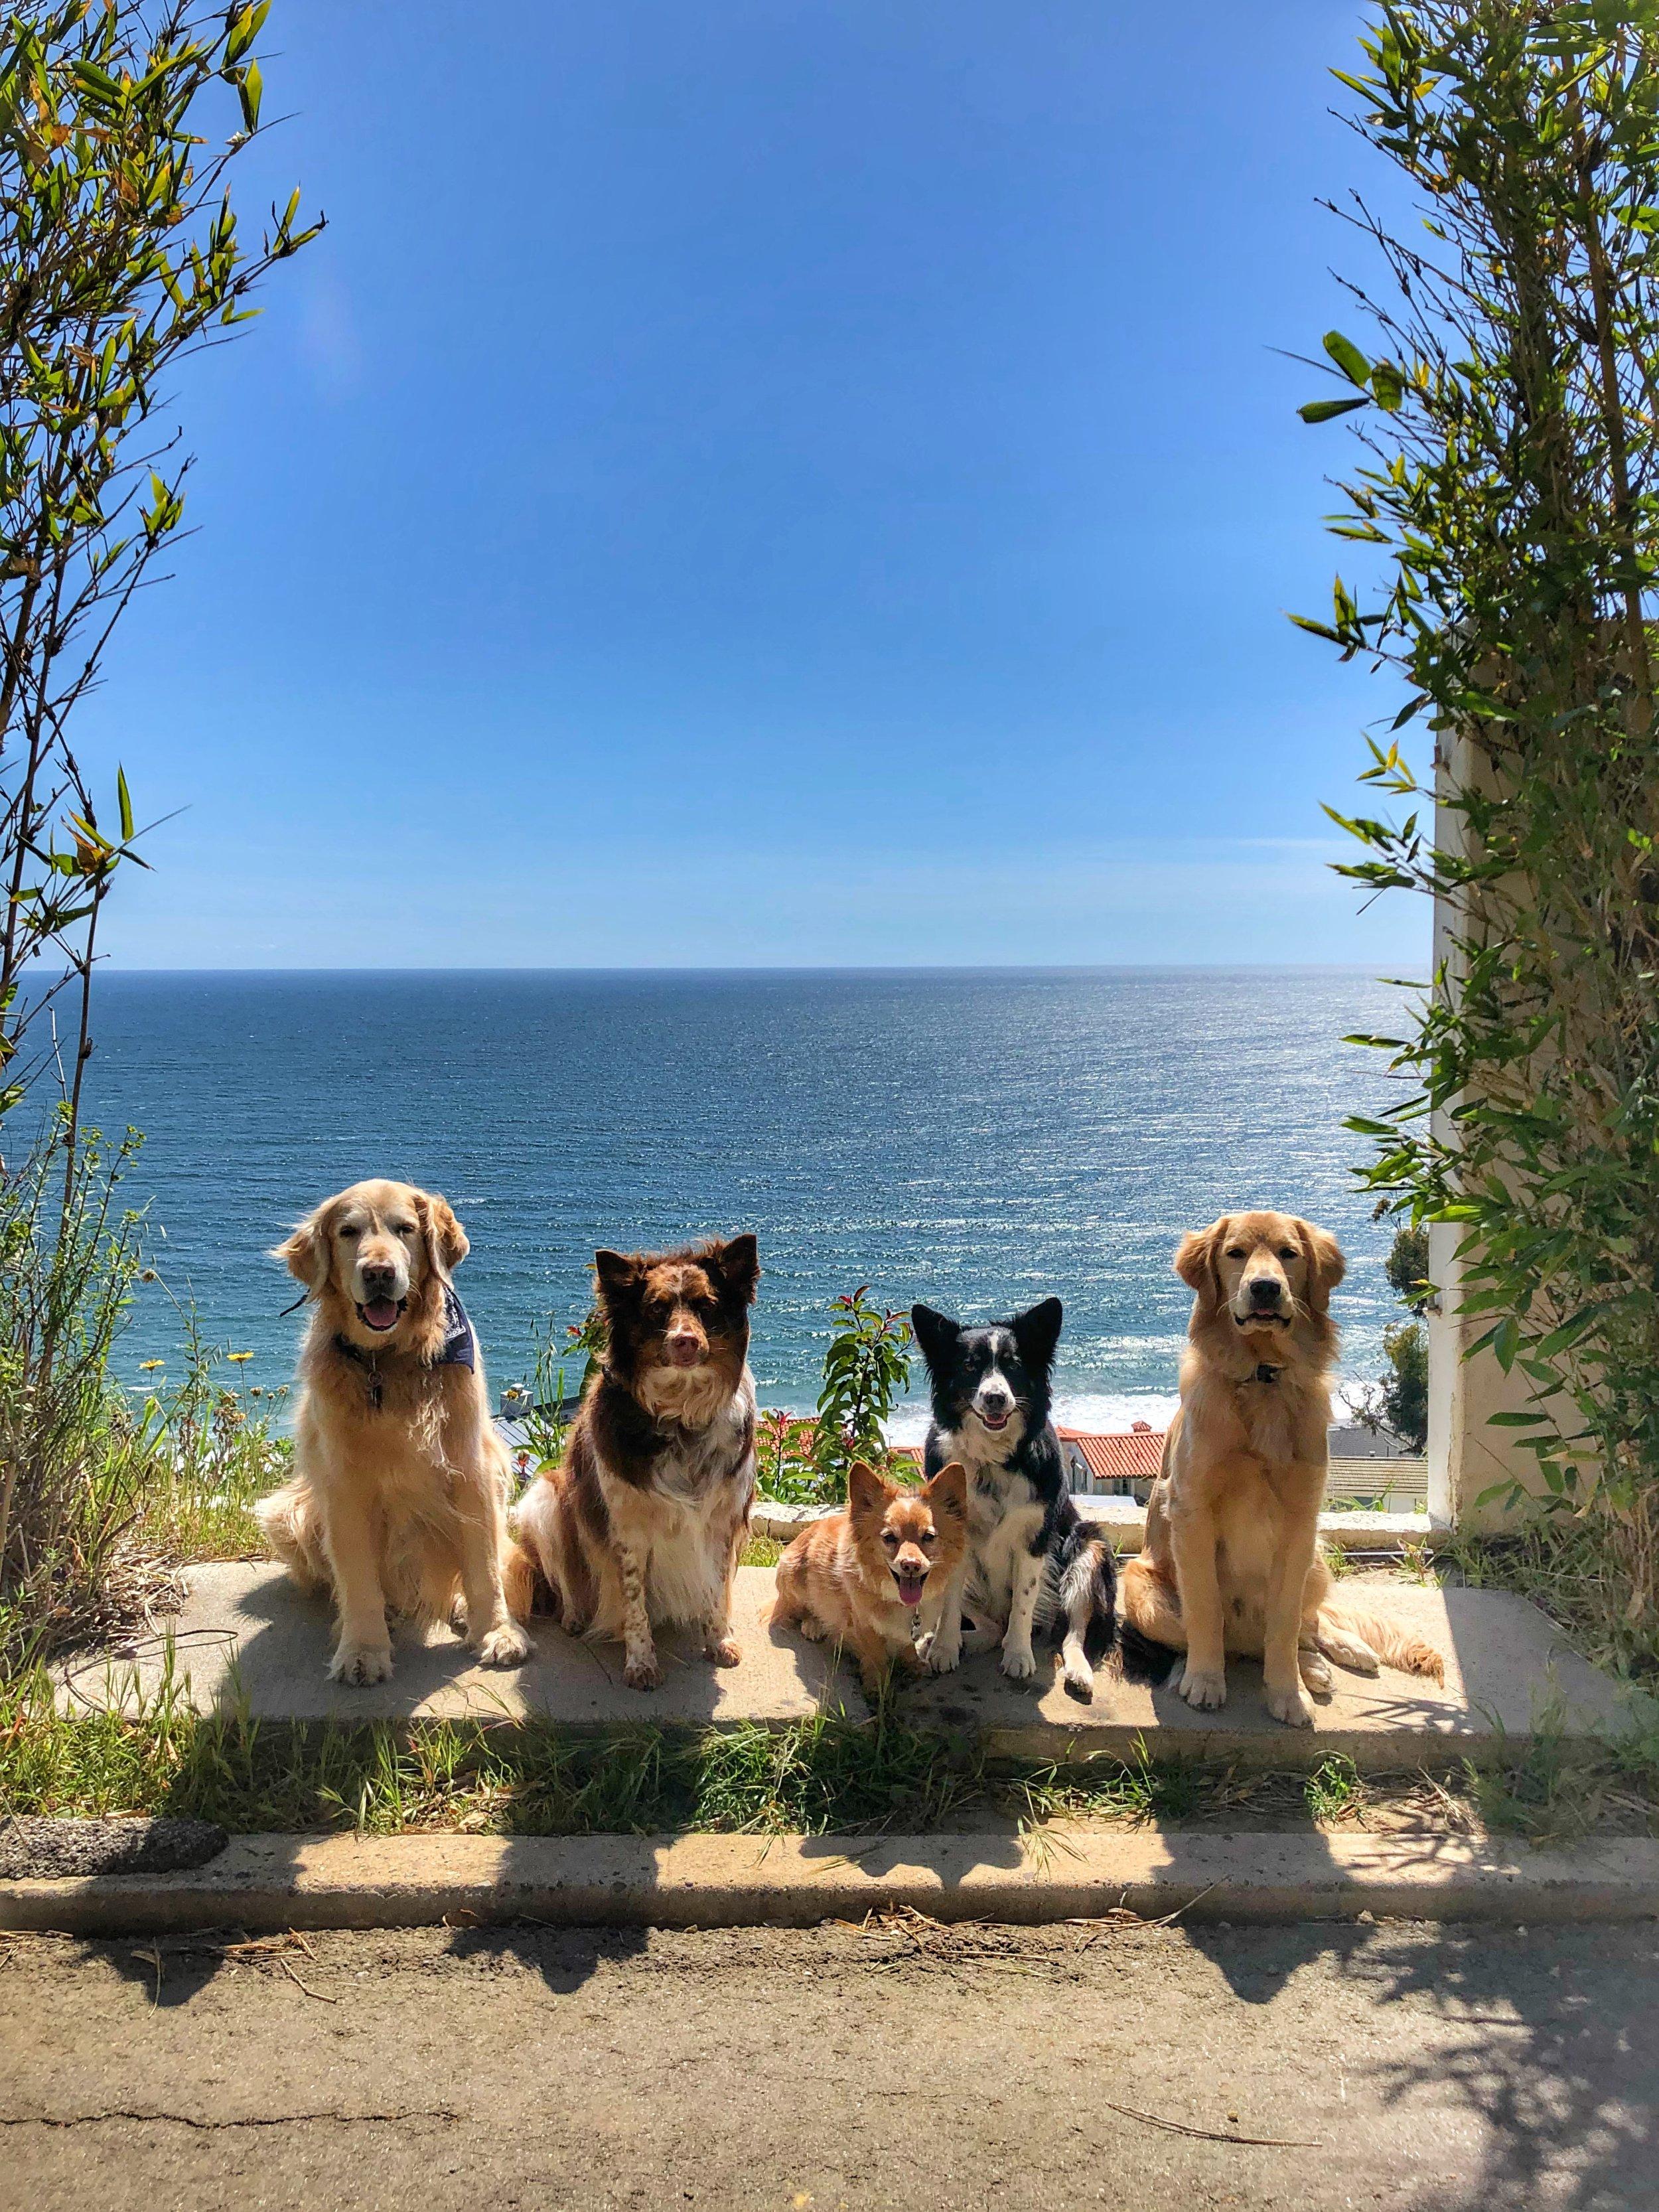 L to R: Bosco, Pasha, Mr Fox, Pepper, Loki 🐾